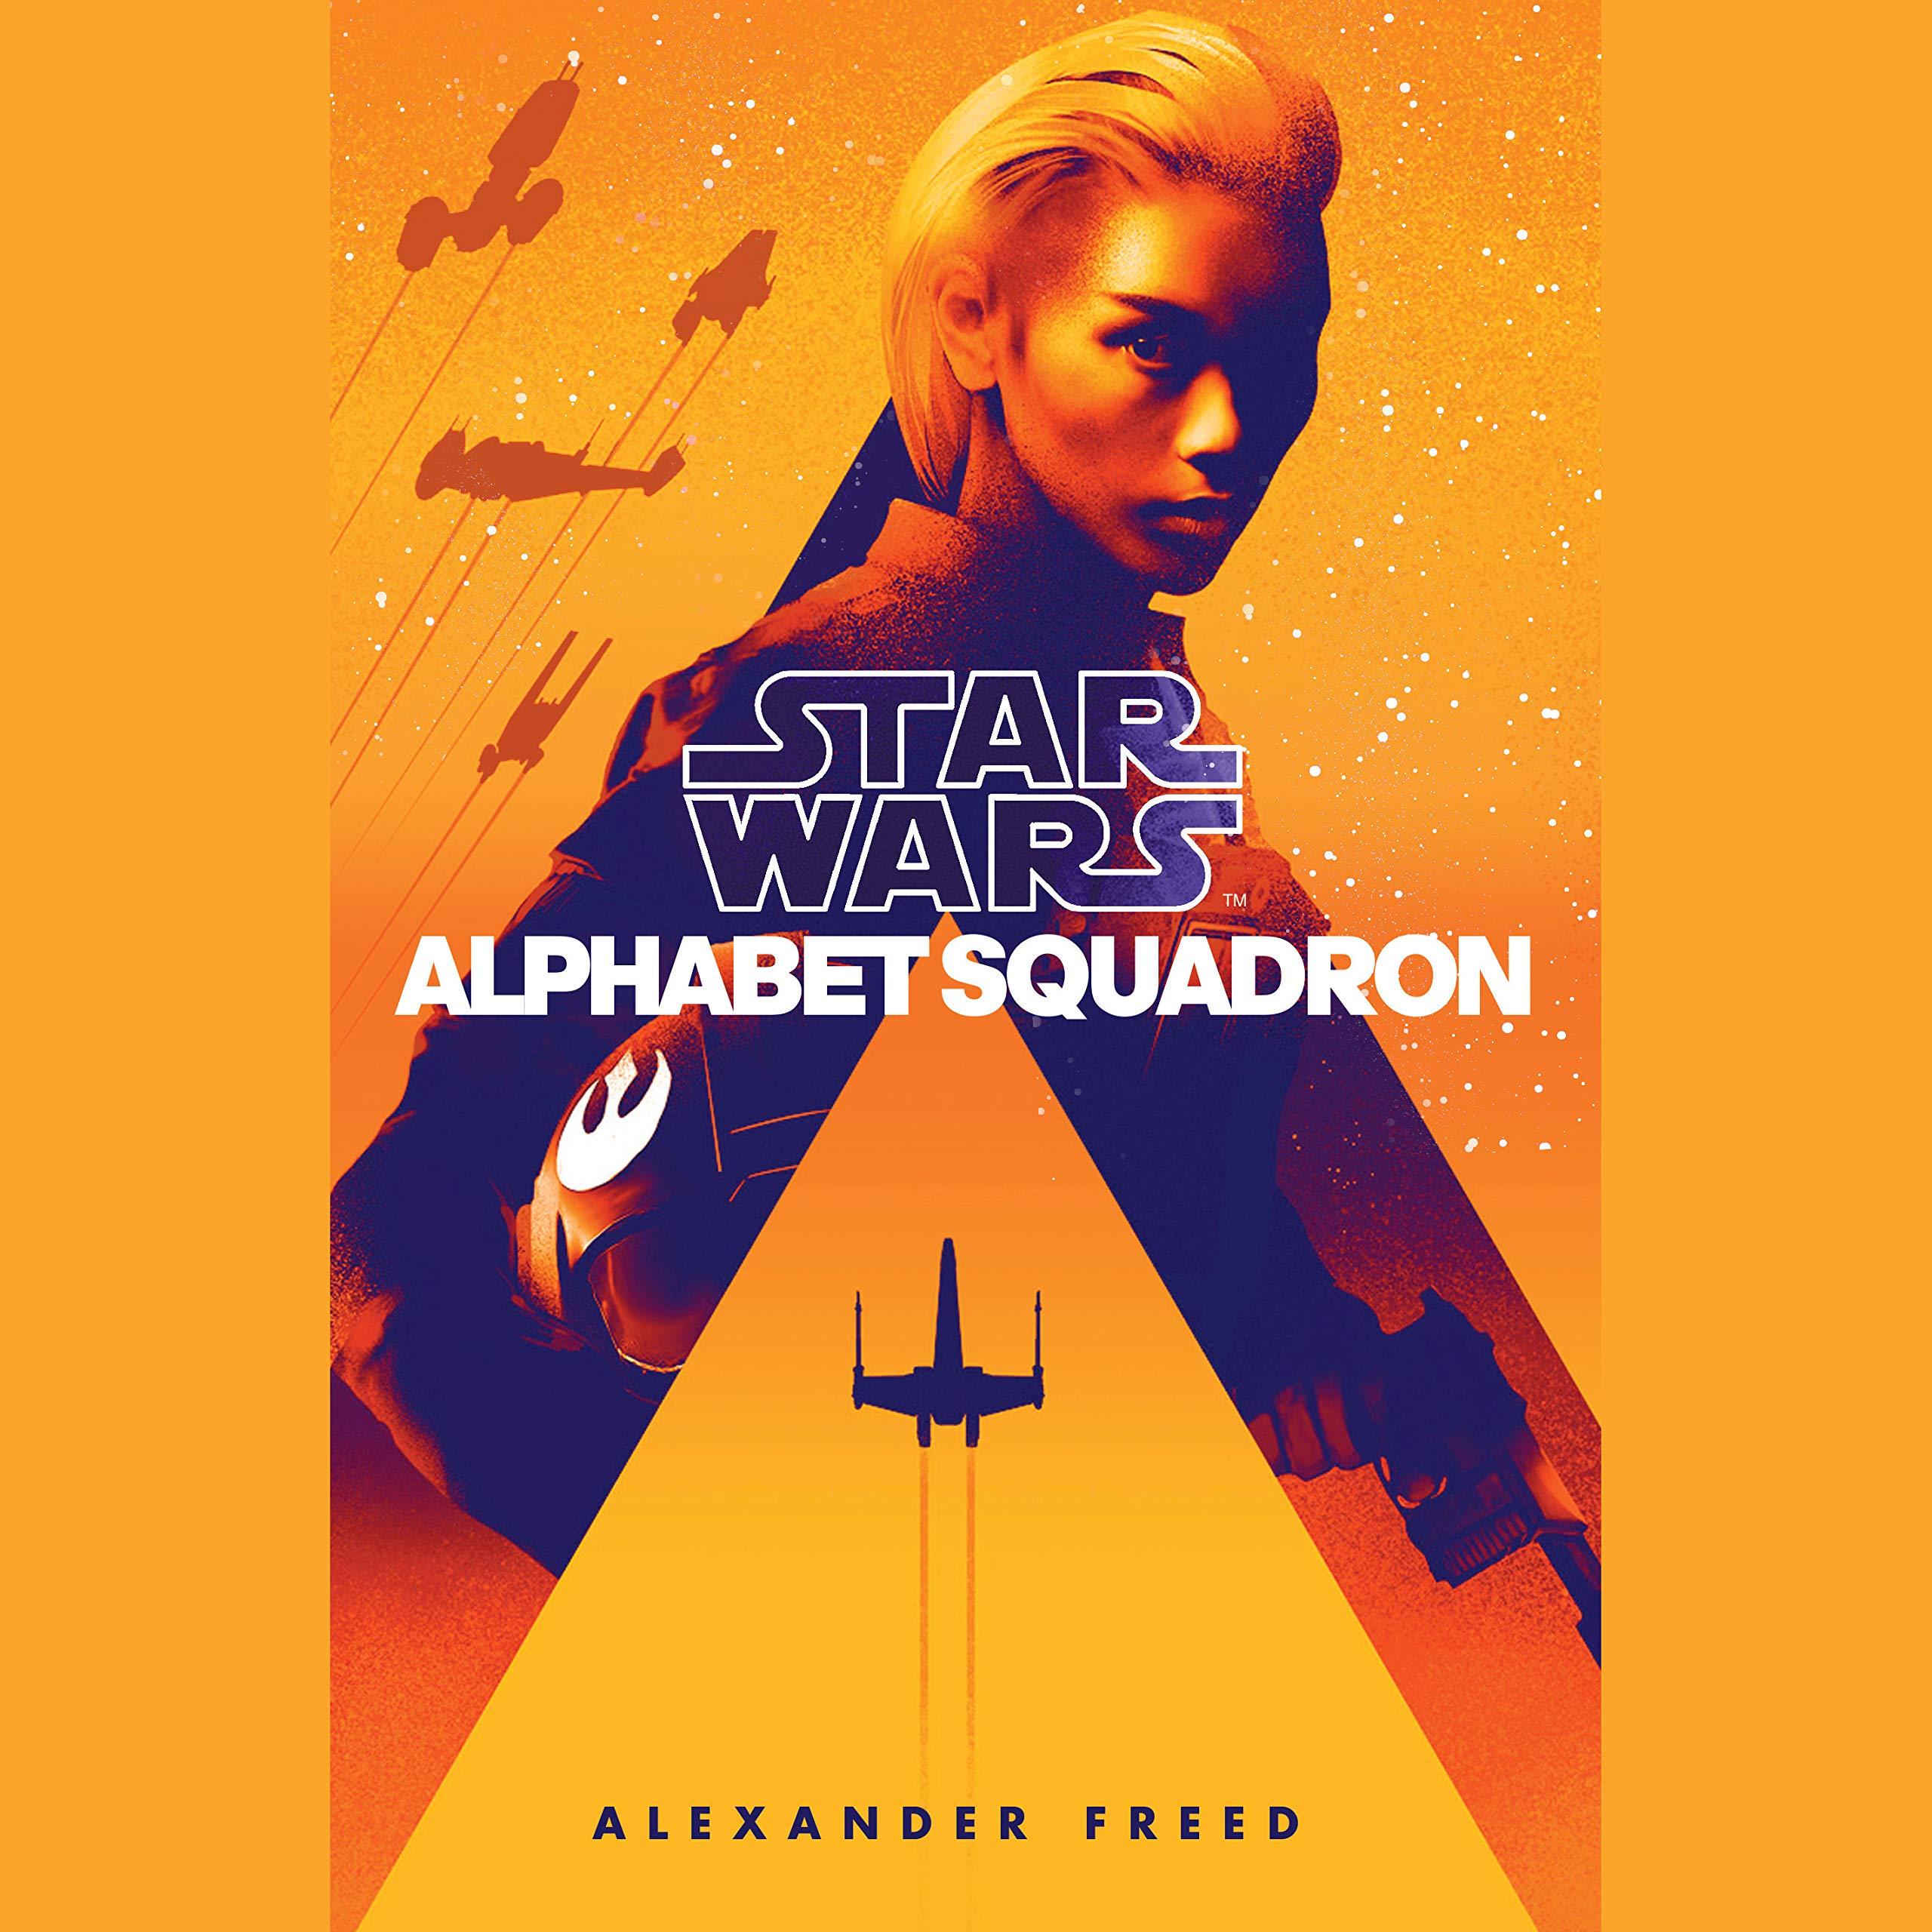 Star Wars - Alphabet Squadron (2019) - Alexander Freed